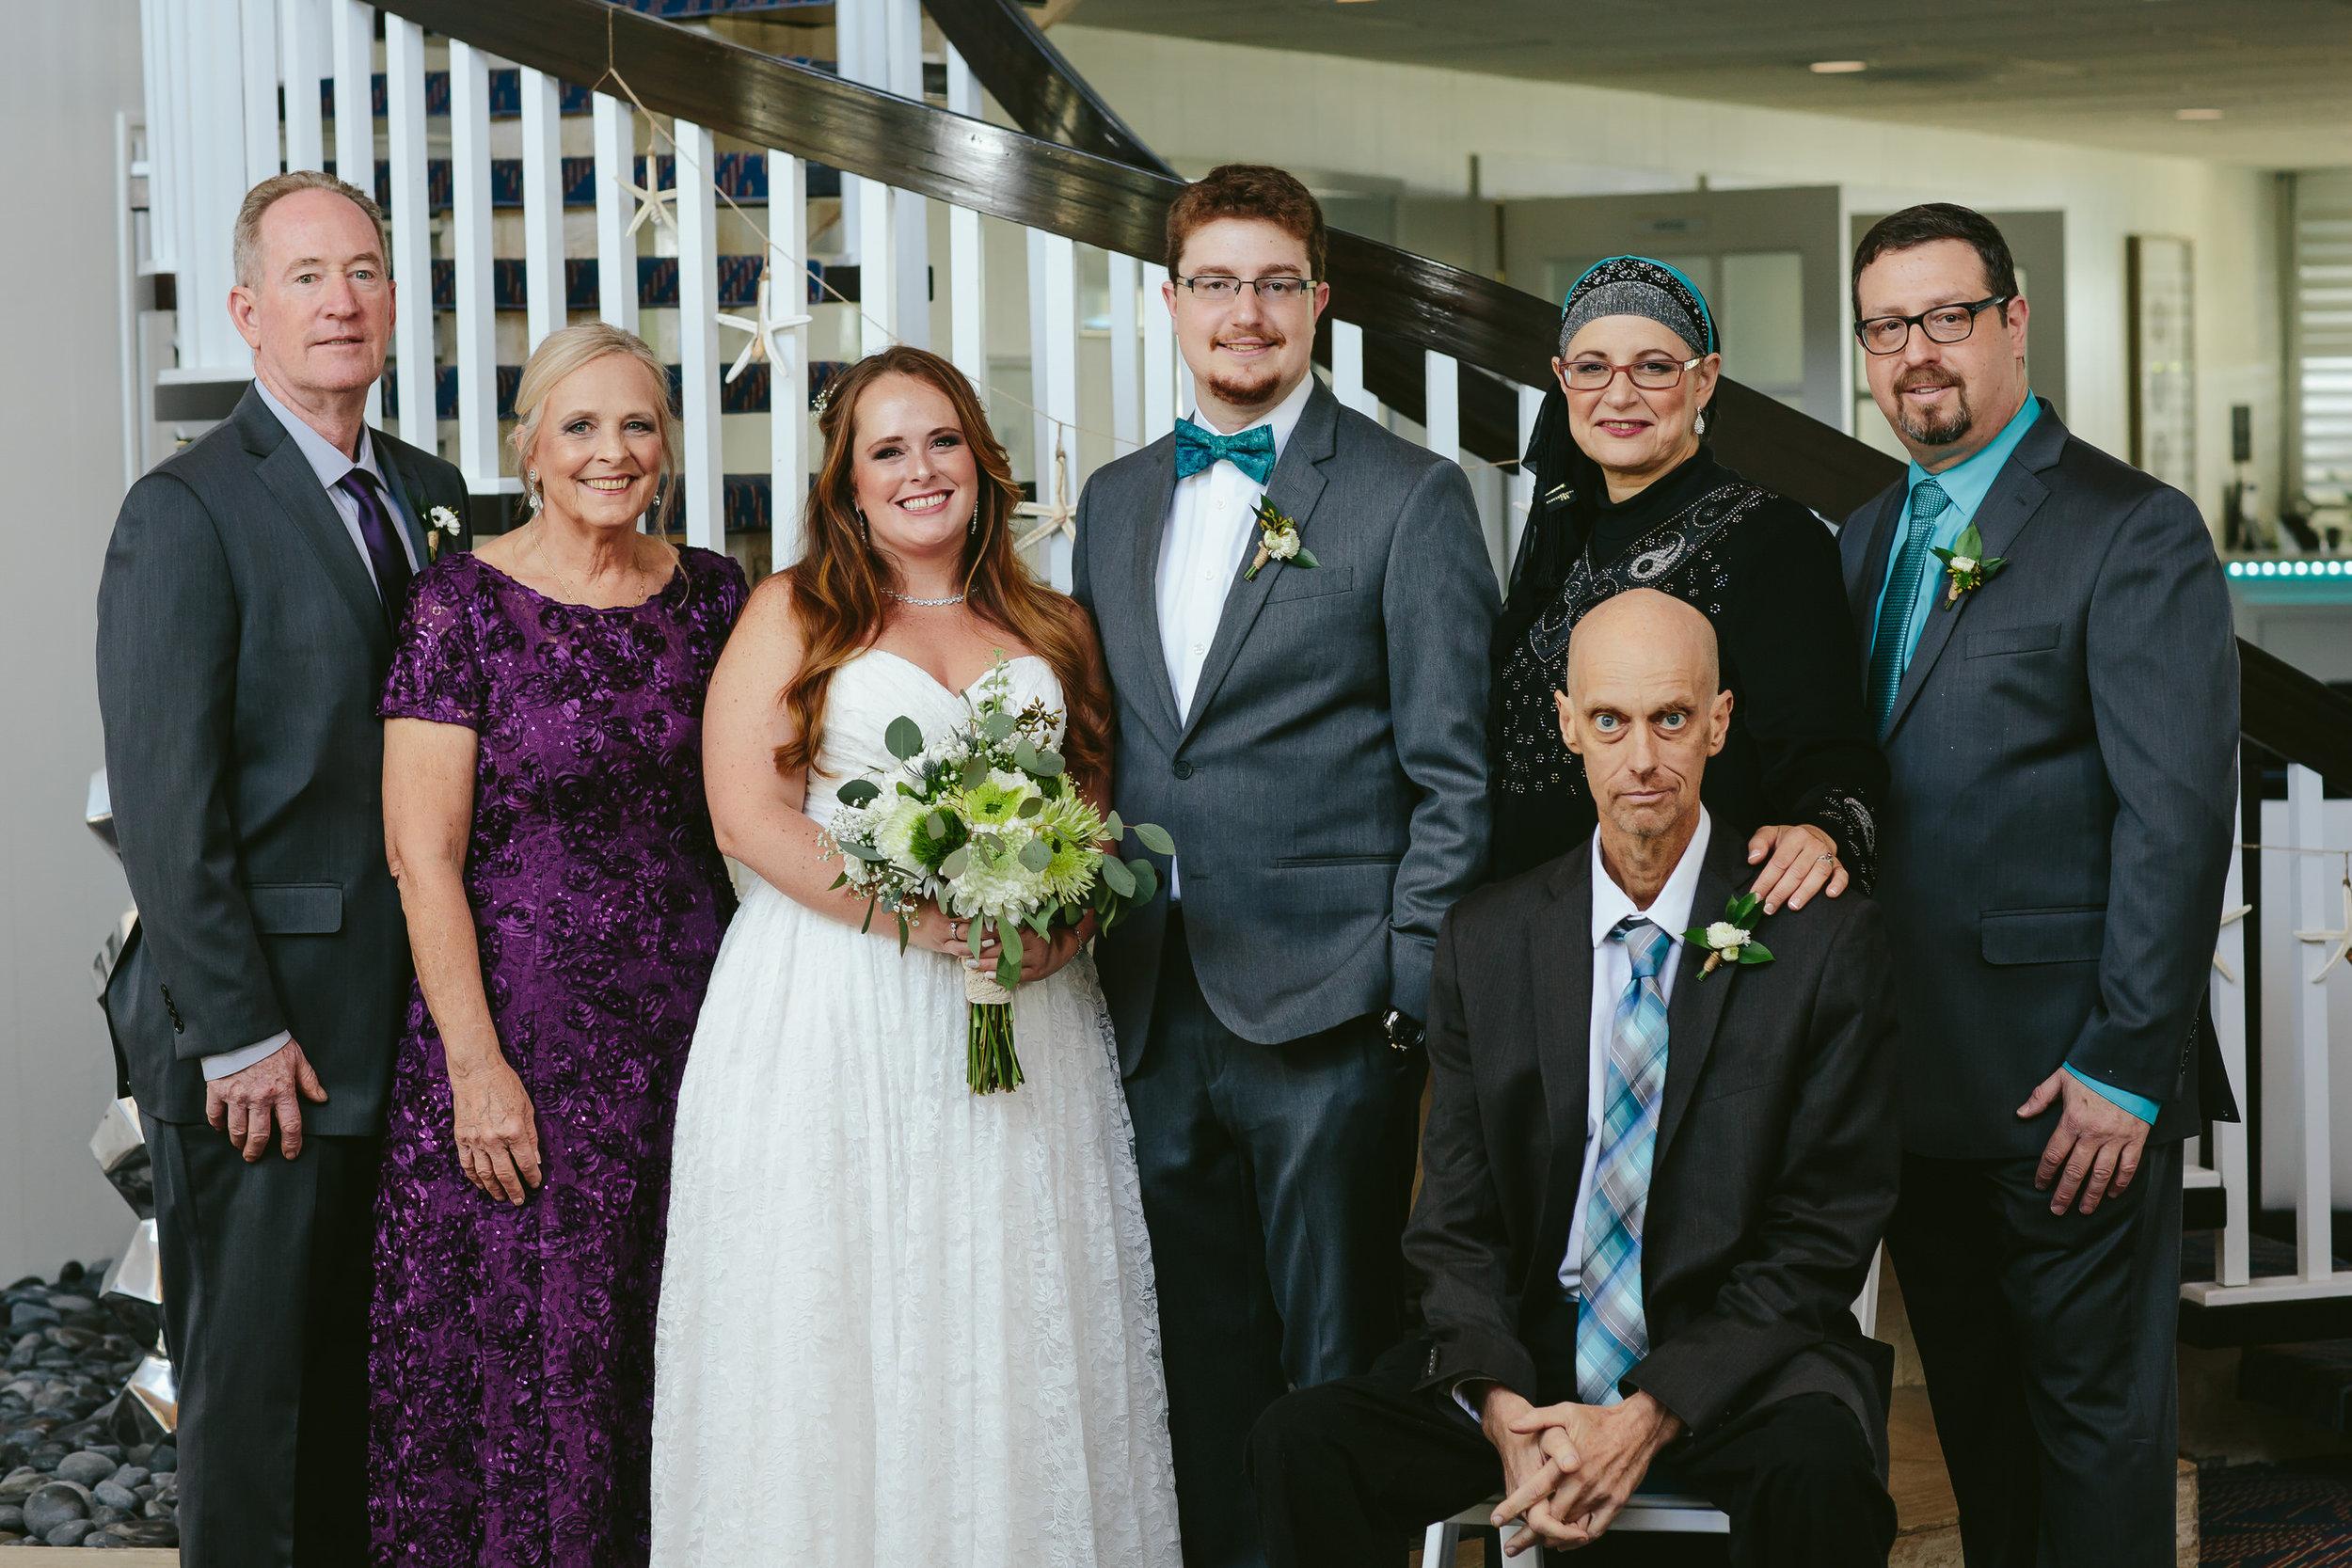 lighthouse_point_yacht_club_wedding_family_formals_steph_lynn_photo-18.jpg